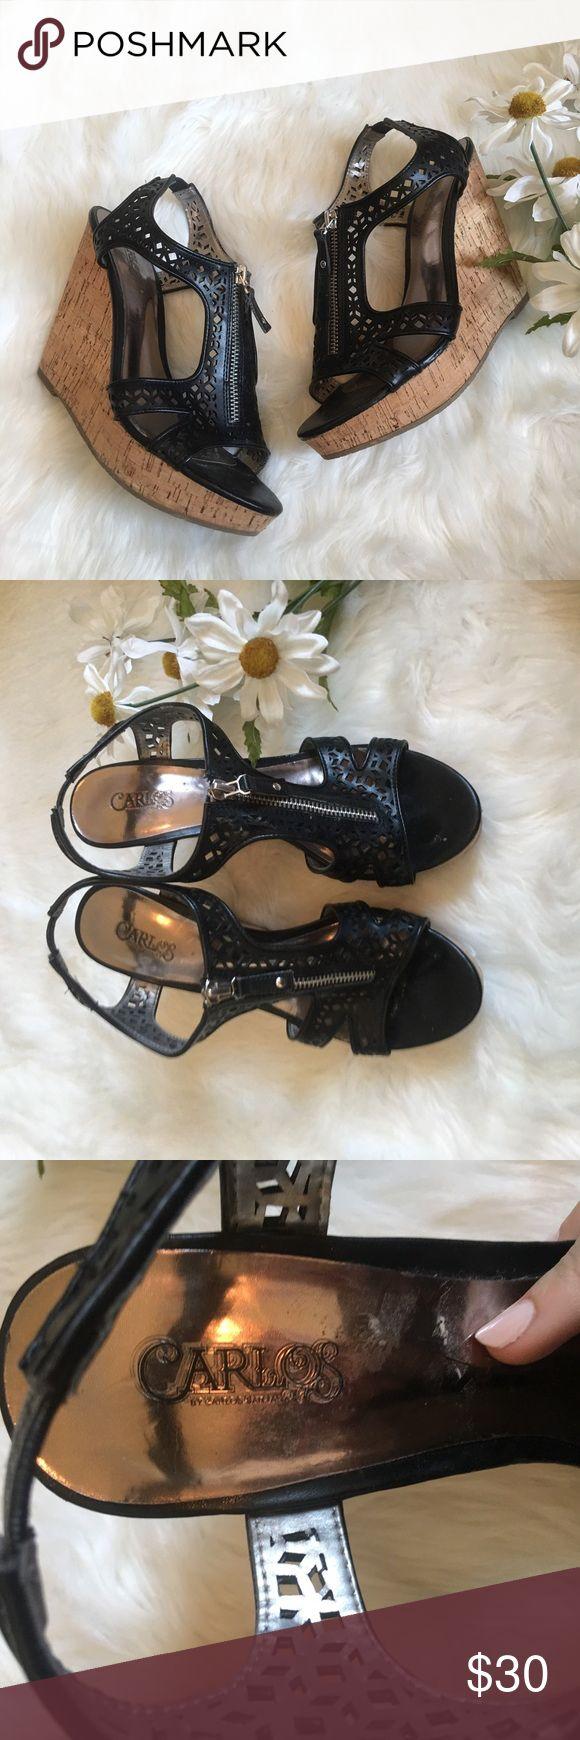 Carlos Santana black zip up lace look wedges Perfect condition, very comfortable, no flaws Carlos Santana Shoes Wedges